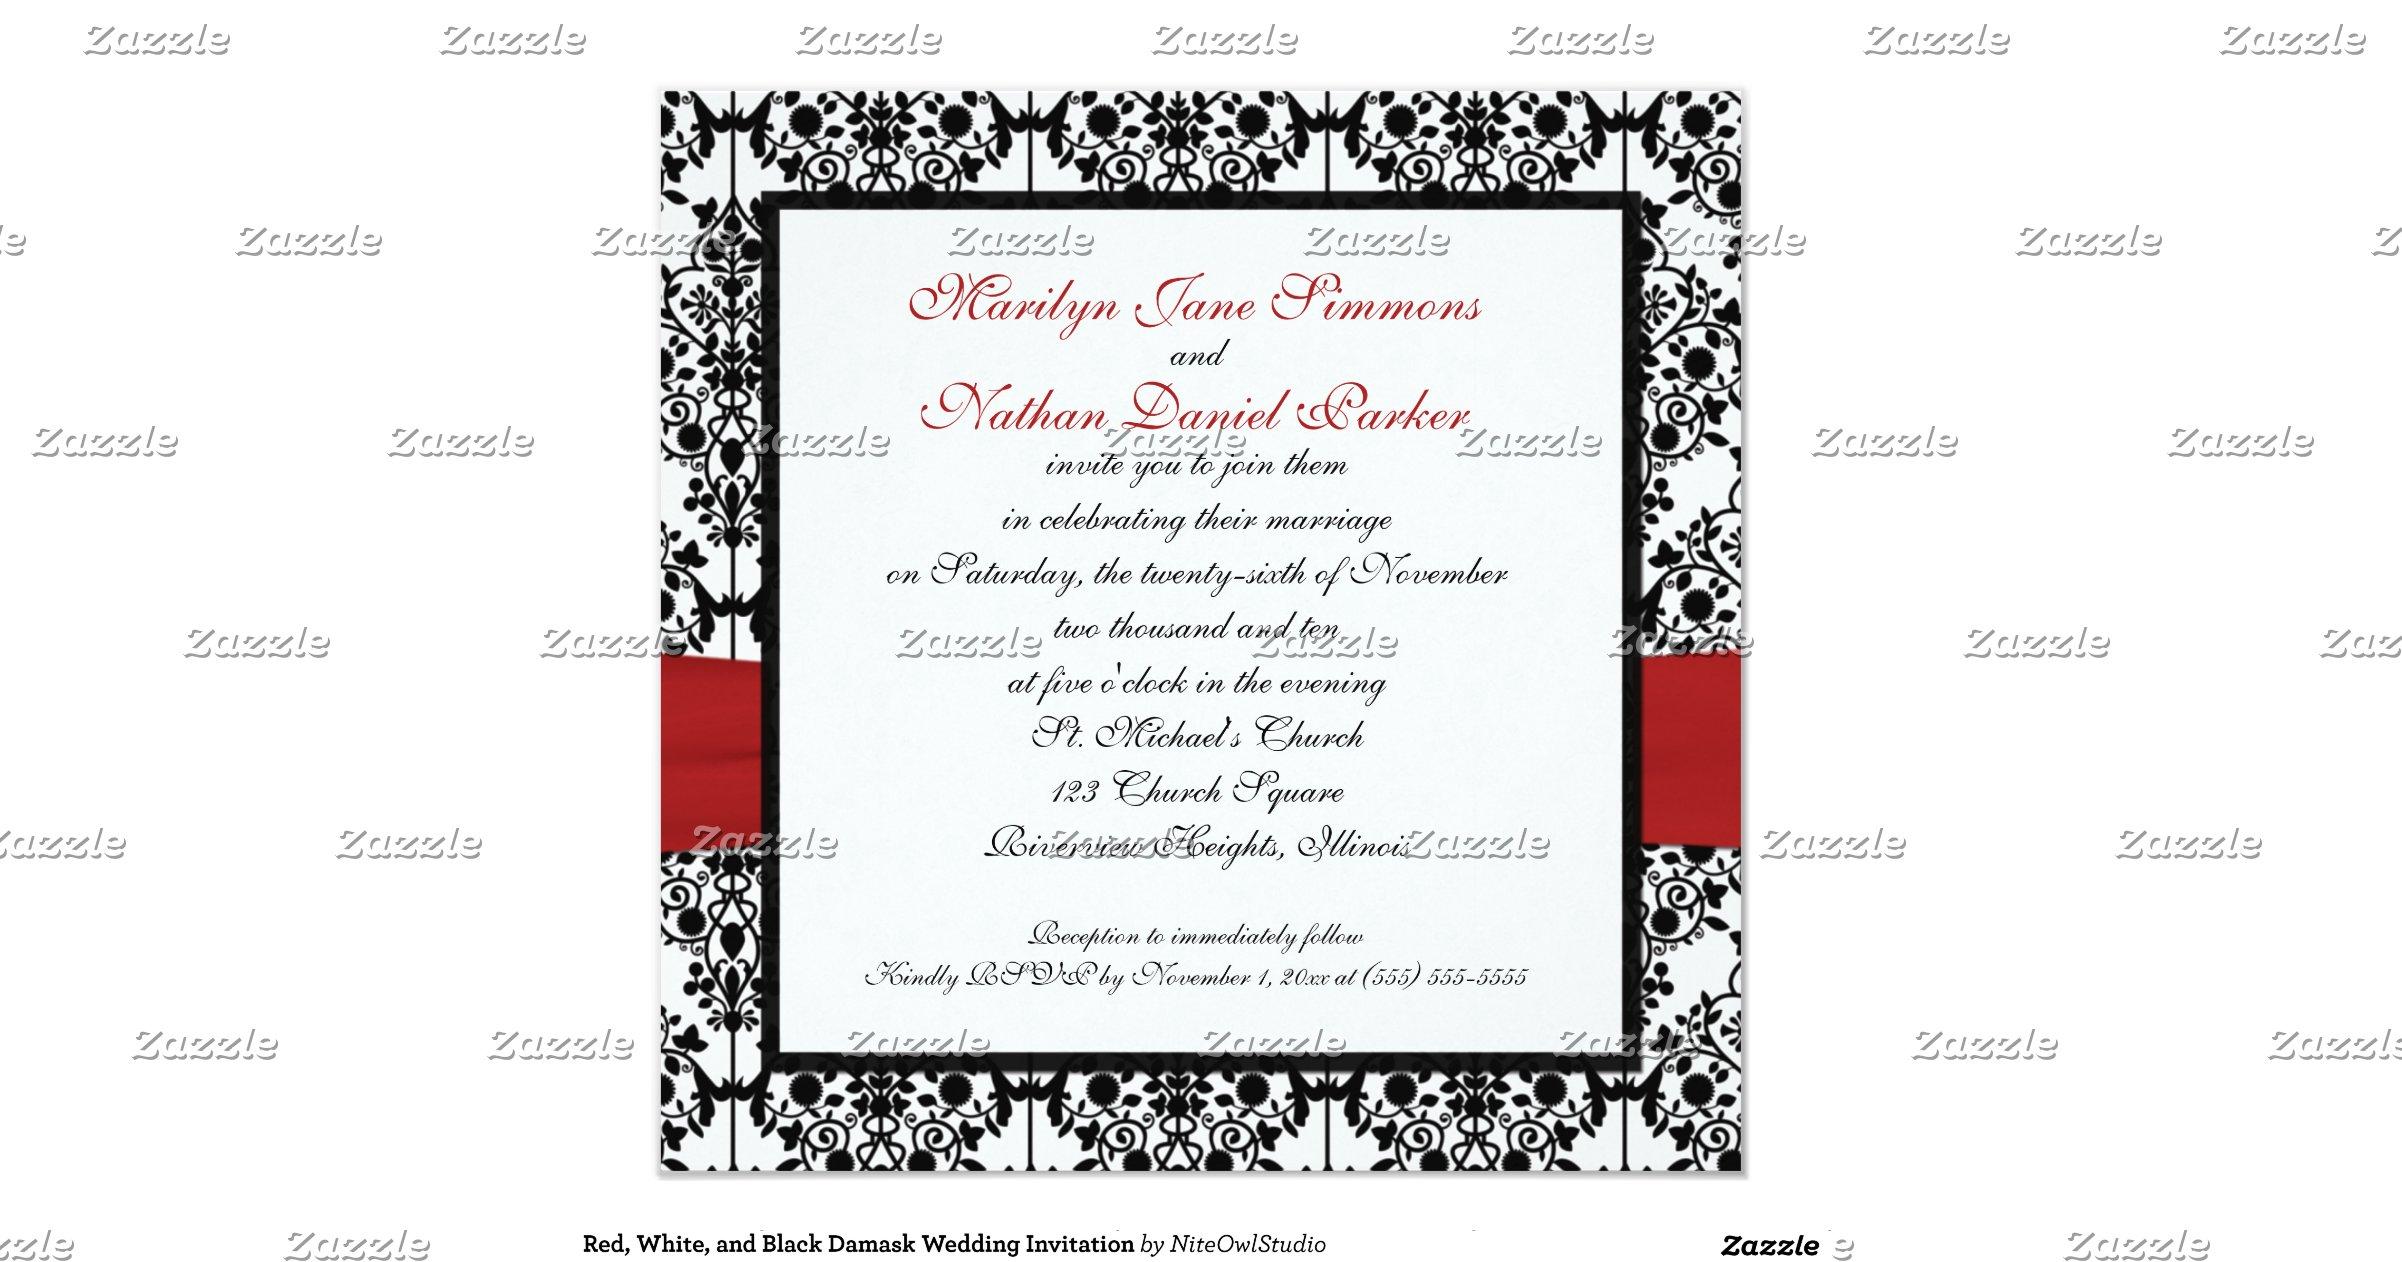 Red White And Black Damask Wedding Invitation R1672f24839f24a51abbbda1db0292204 Zk9yx 1200